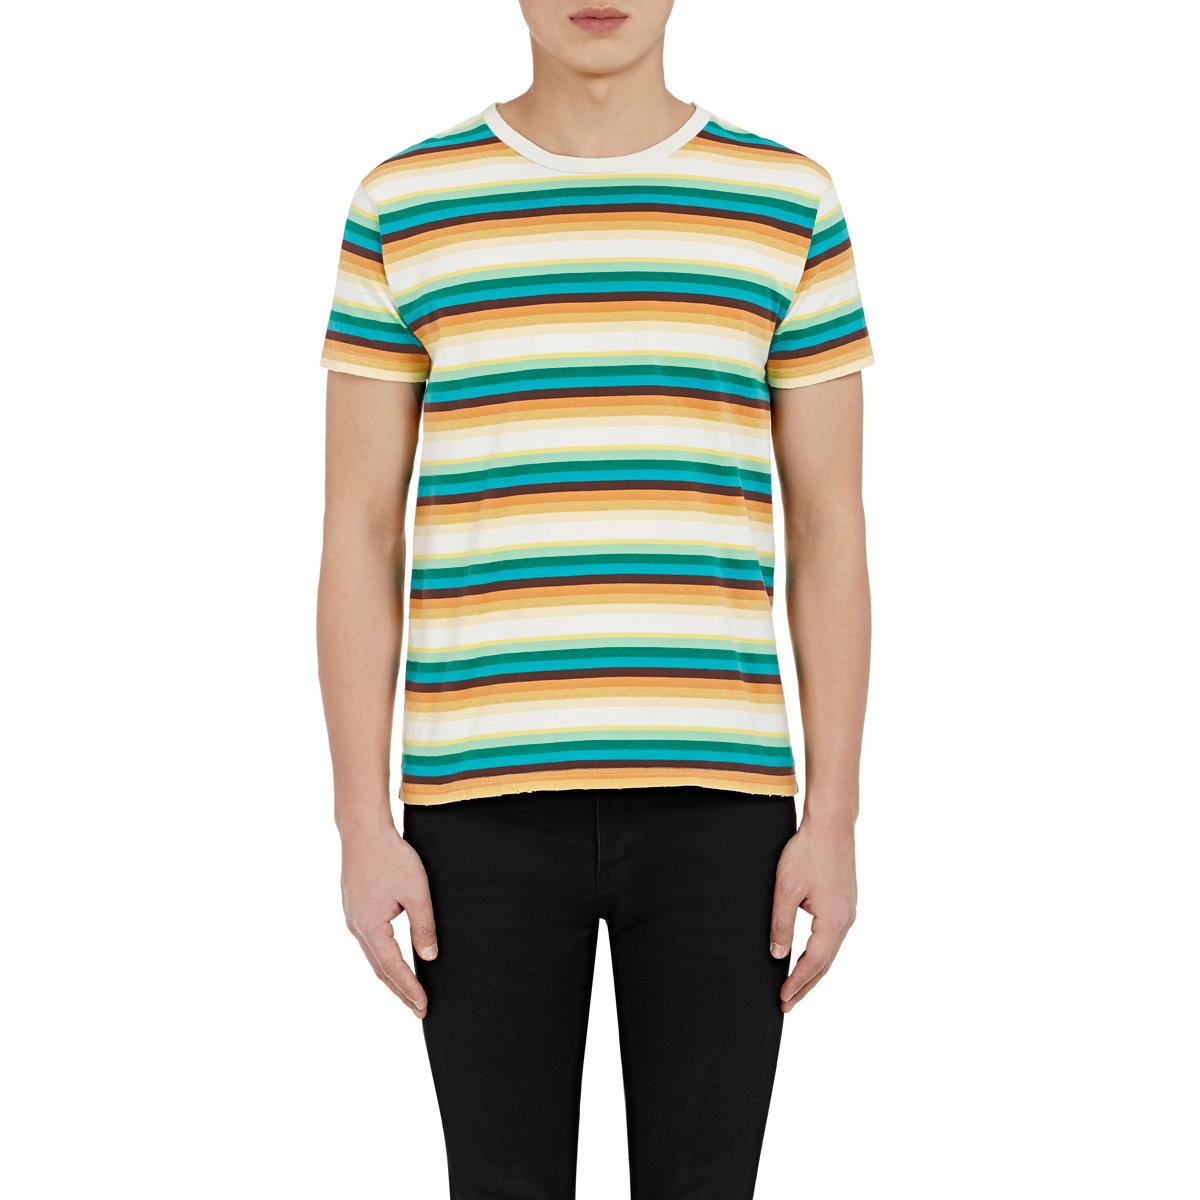 Saint laurent men 39 s striped jersey t shirt in blue for men for Blue white striped t shirt mens